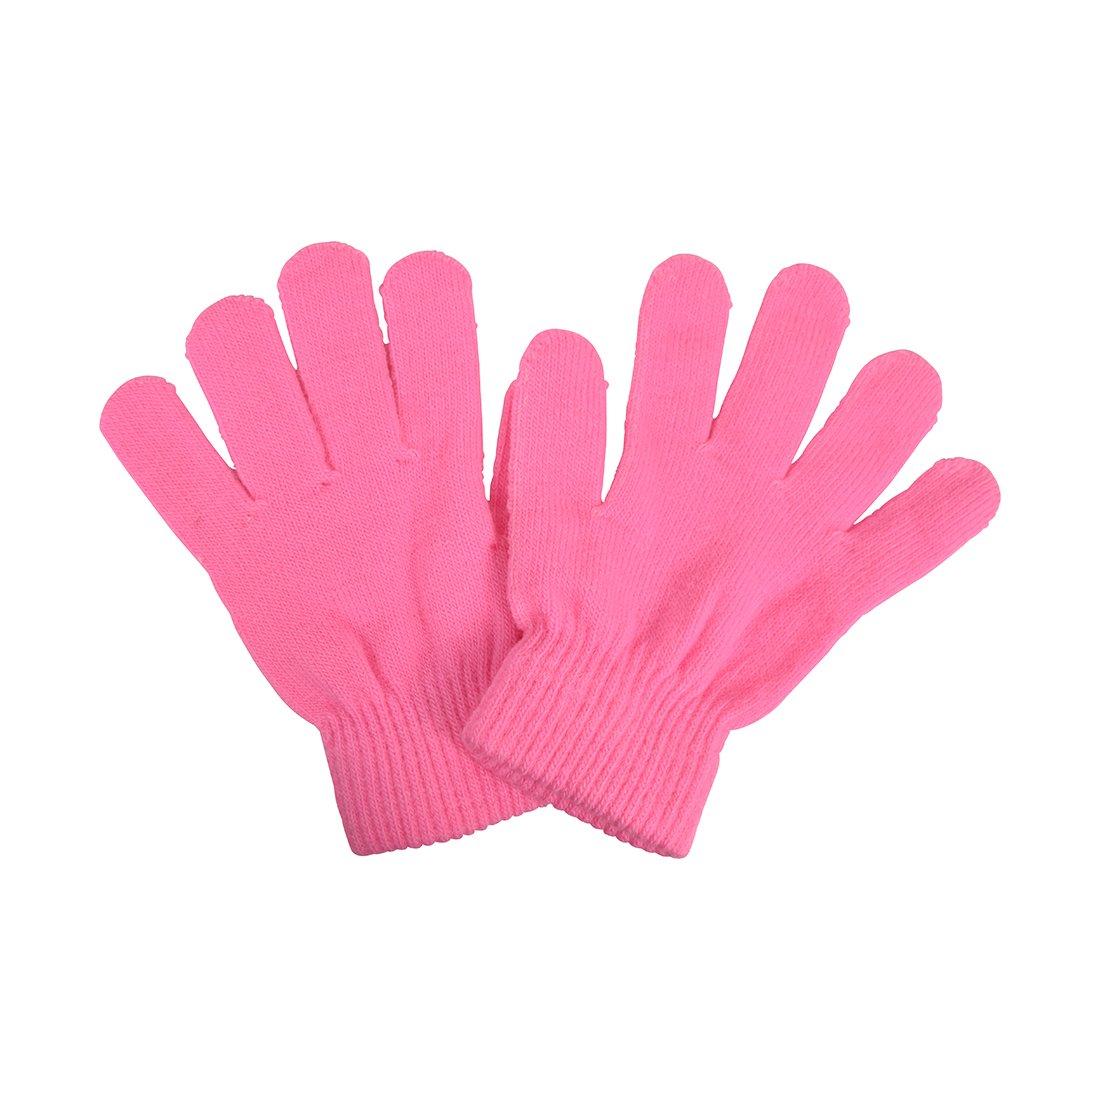 Big Kids Gloves Magic Knit Gloves unisex Solid Colors MTGL0030PK